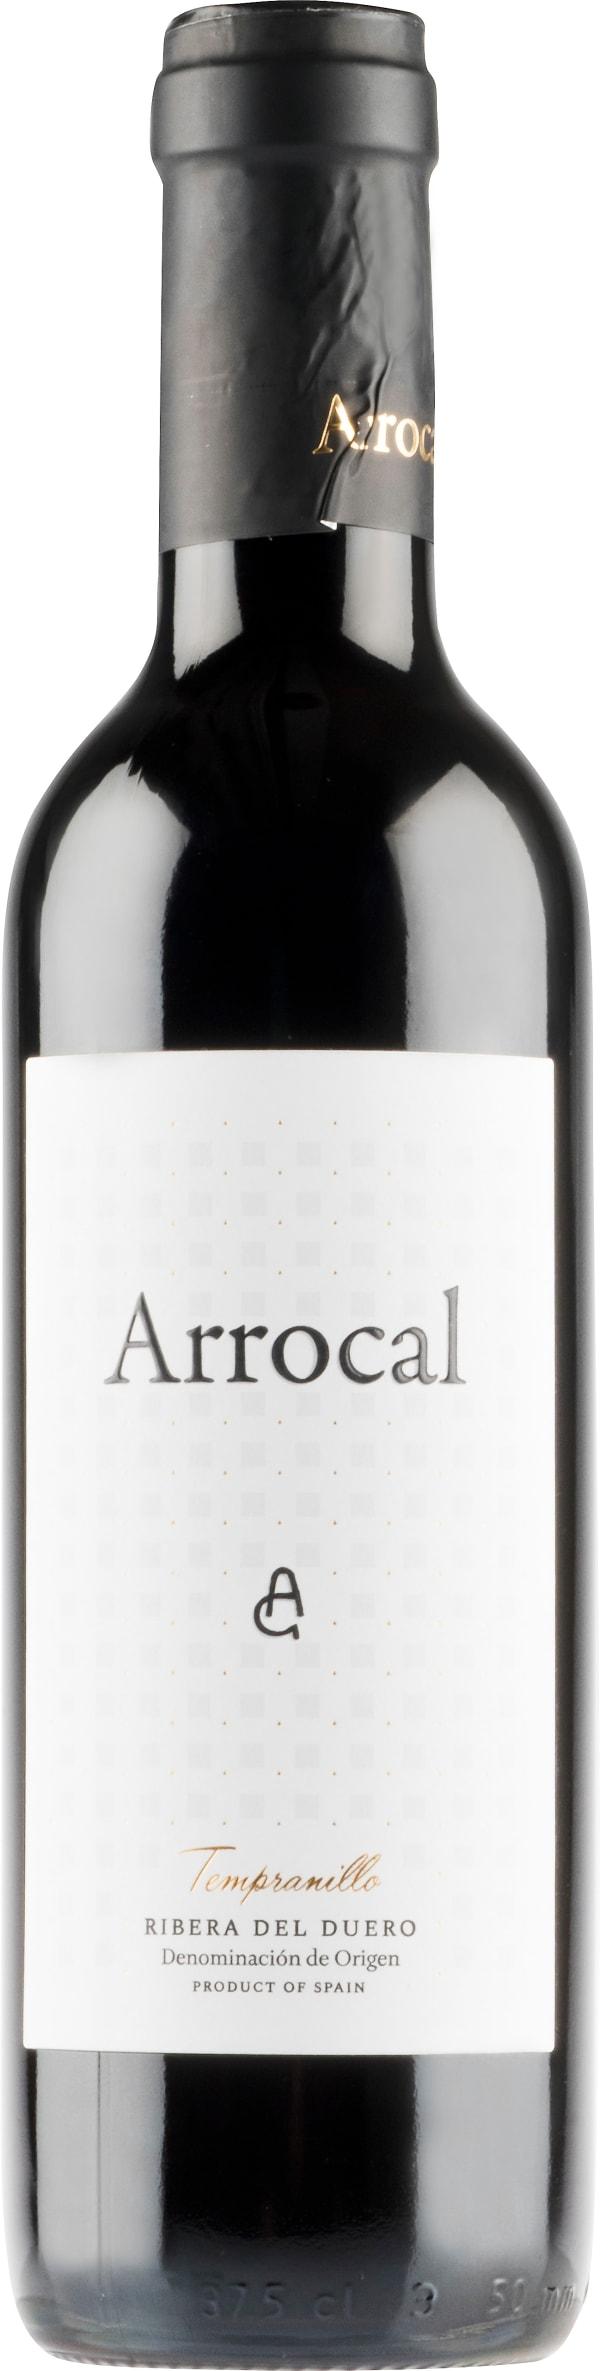 Arrocal 2018